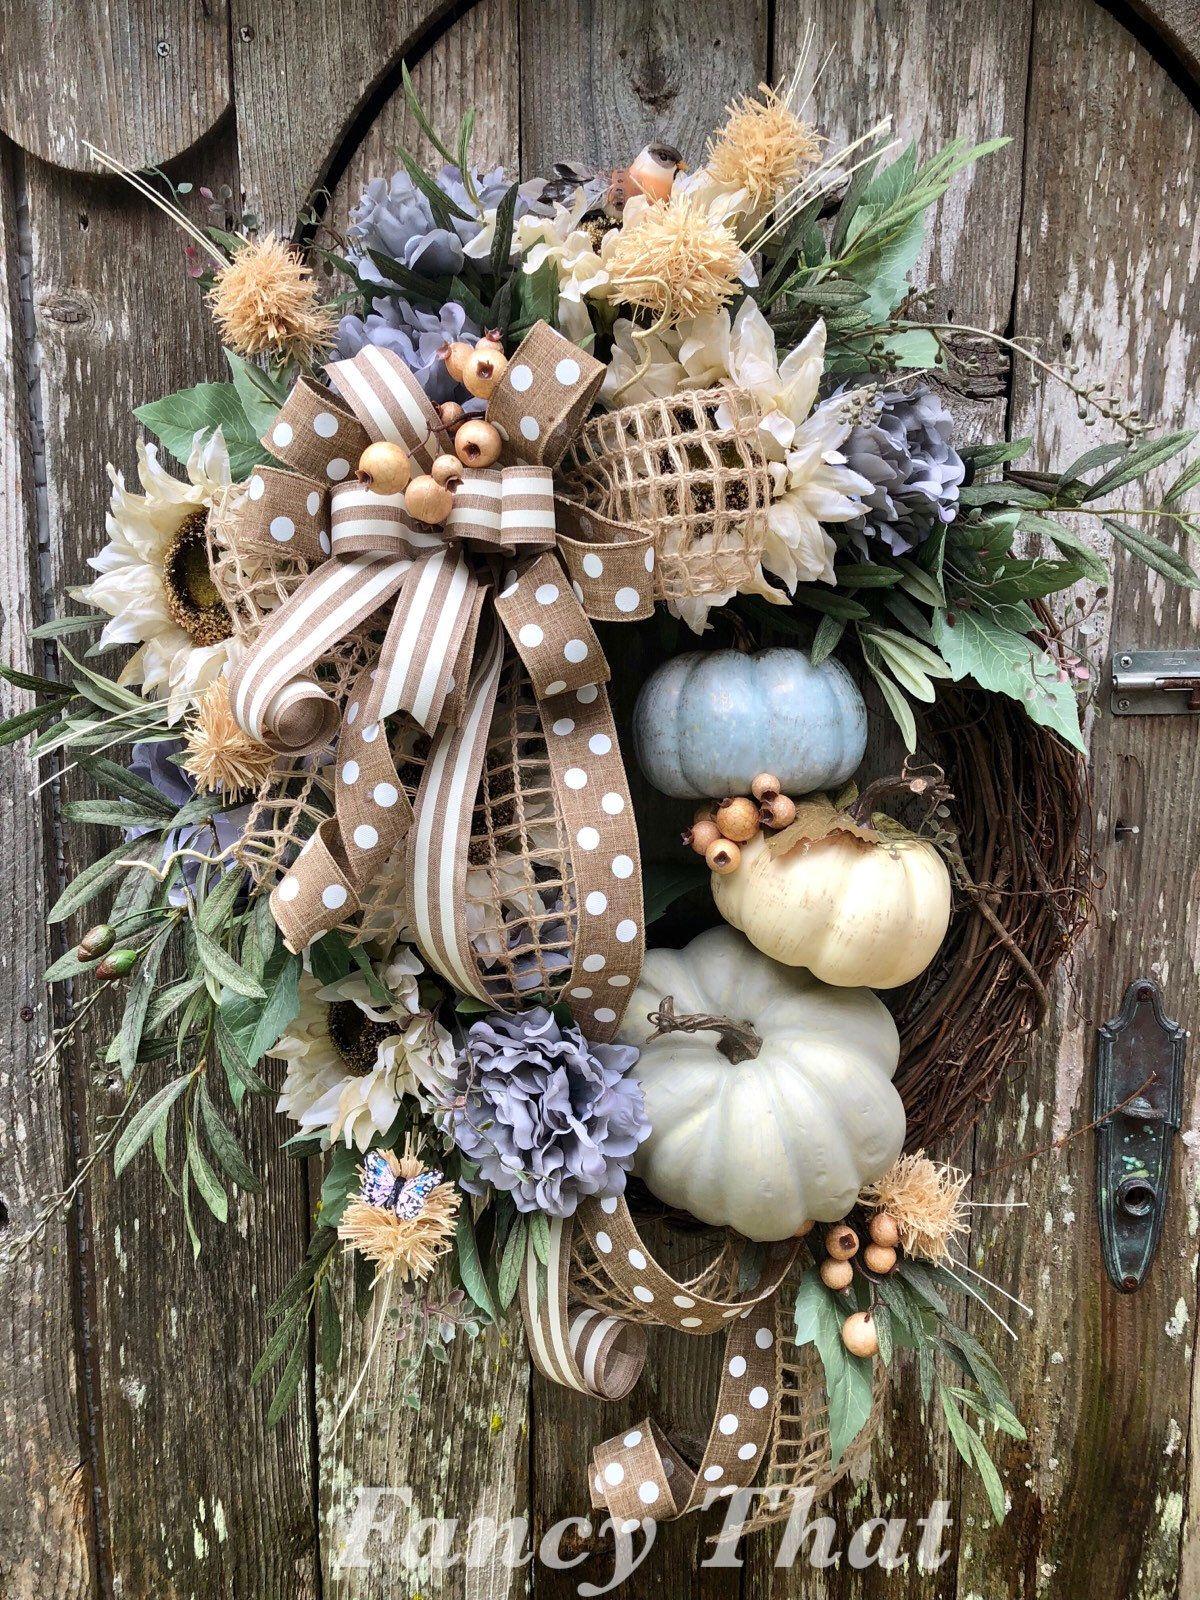 Pumpkin Wreath Thanksgiving Wreath Front Door Decor Farmhouse Decor Fall Decorations Burlap Wreath Fall Wreath Burlap Pumpkin Wreath